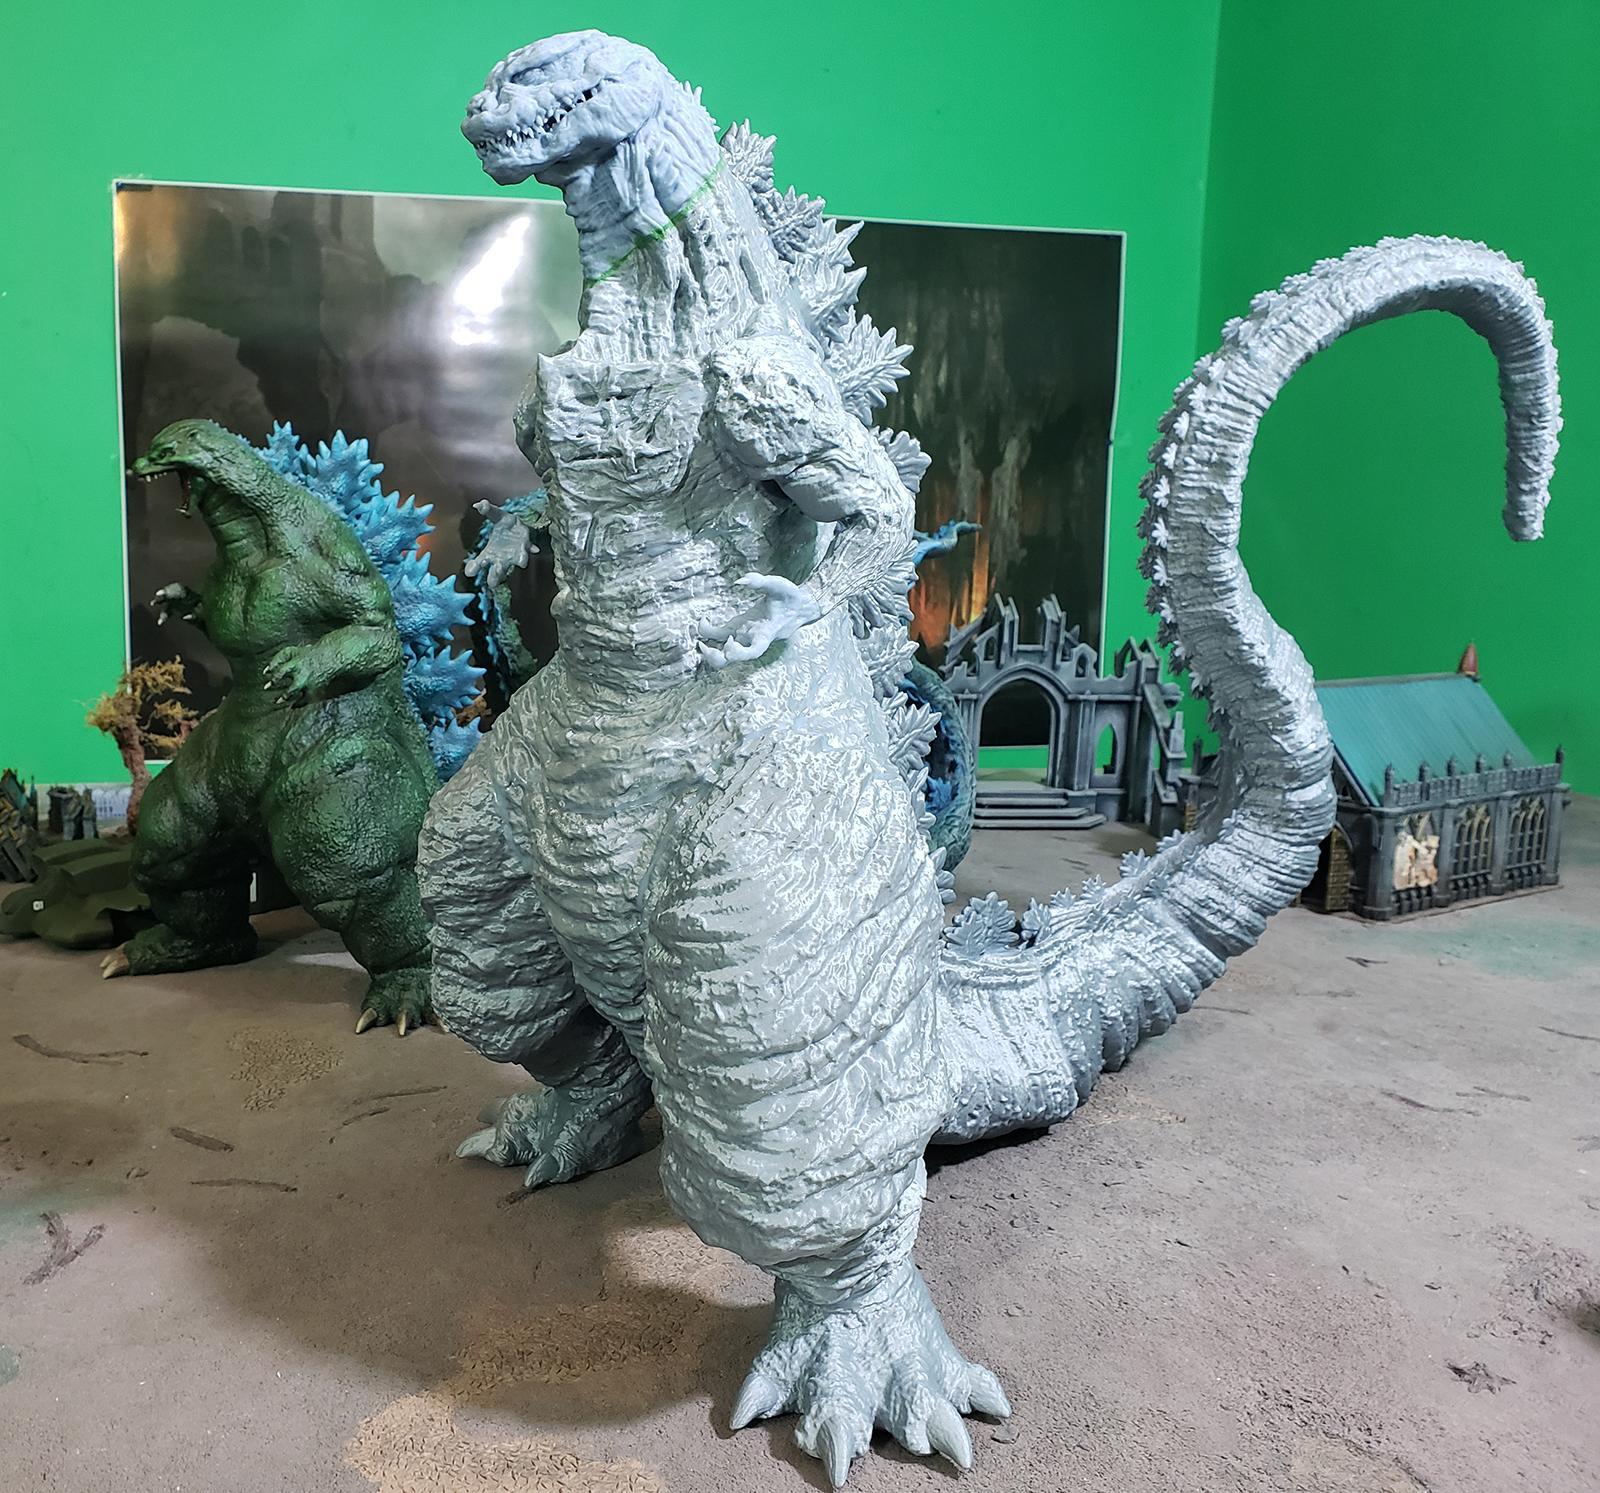 3d Printing, Anycubic I3 Mega, Anycubic Photon, Dlp, Fdm, Gambody, Godzilla, Kaiju, Large, Shin Godzilla